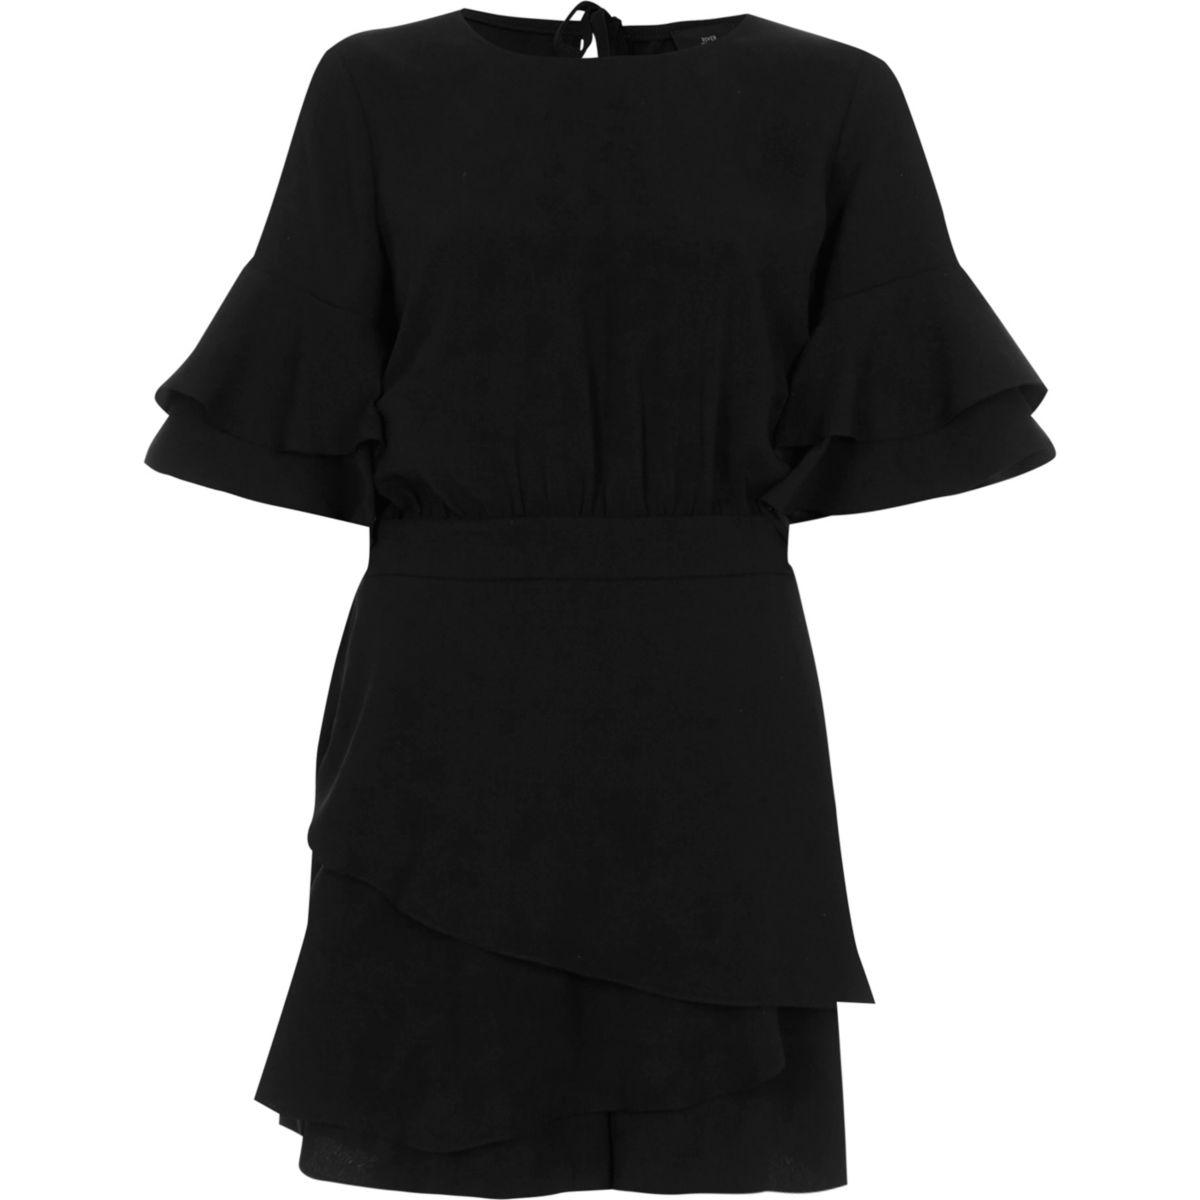 Black frill short sleeve layered hem playsuit